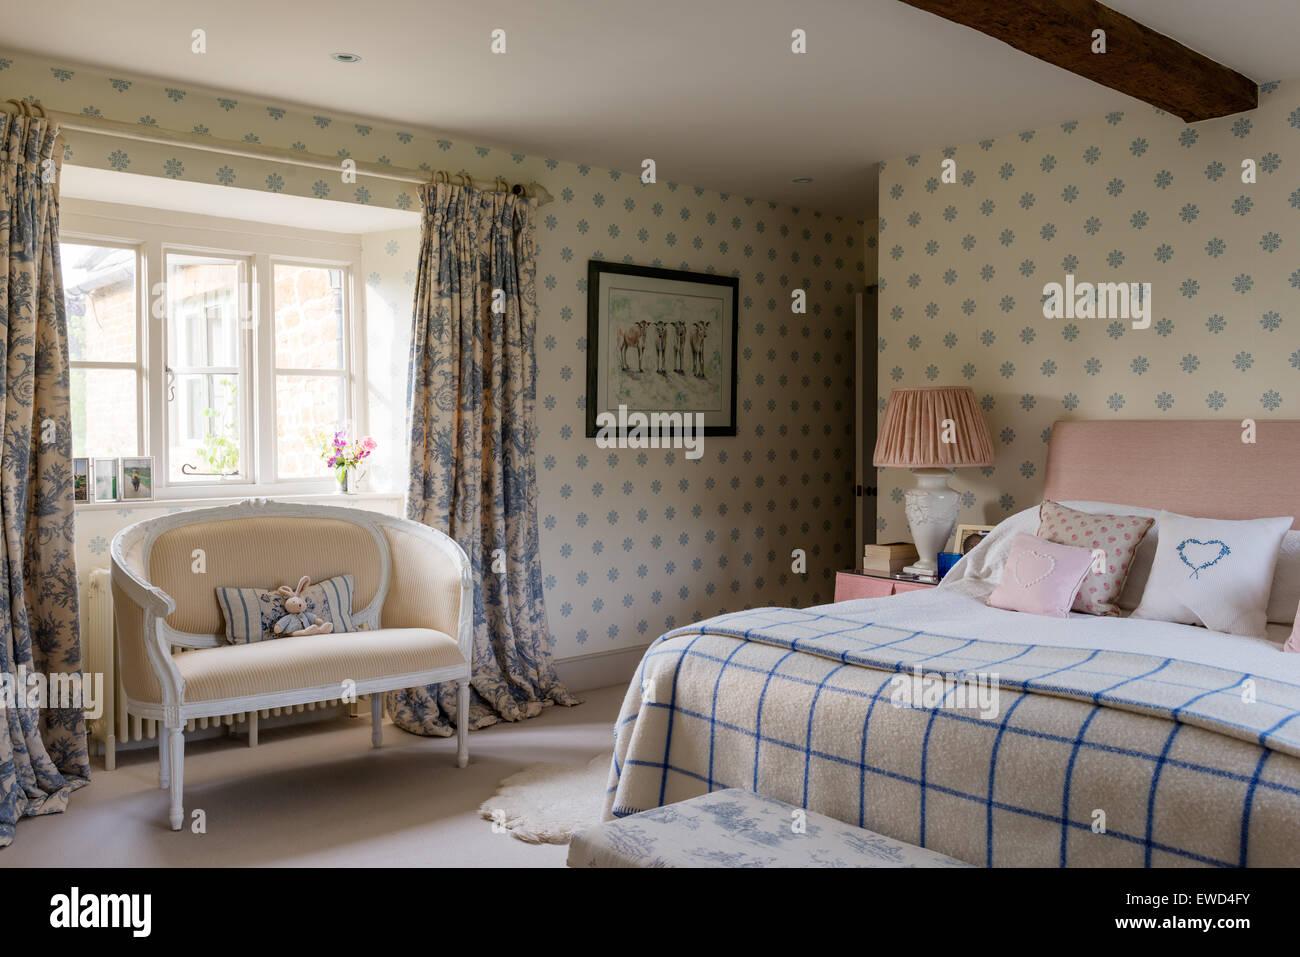 Camera Per Ospiti : Kate forman stile francese di tessuti in camera per ospiti con